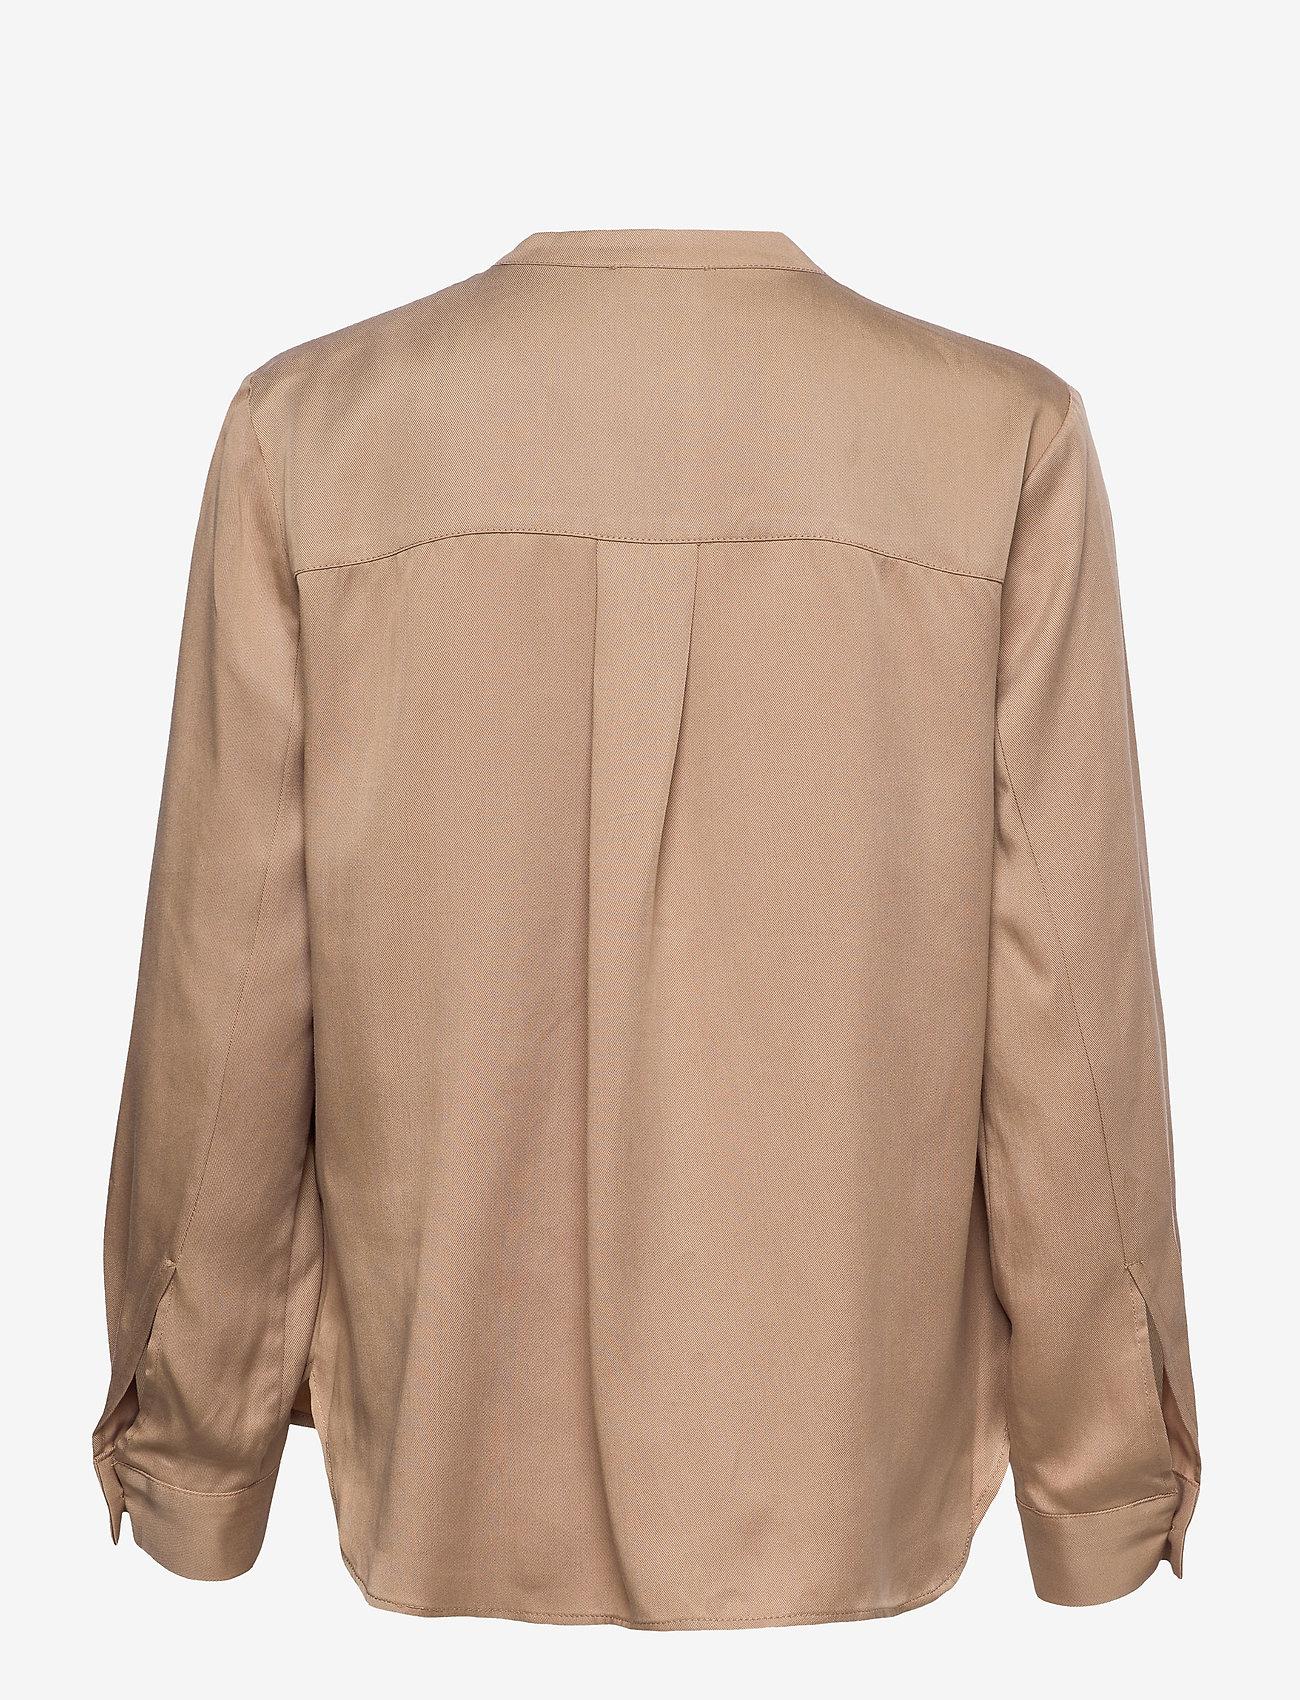 NORR - Jade shirt - langærmede skjorter - beige - 1